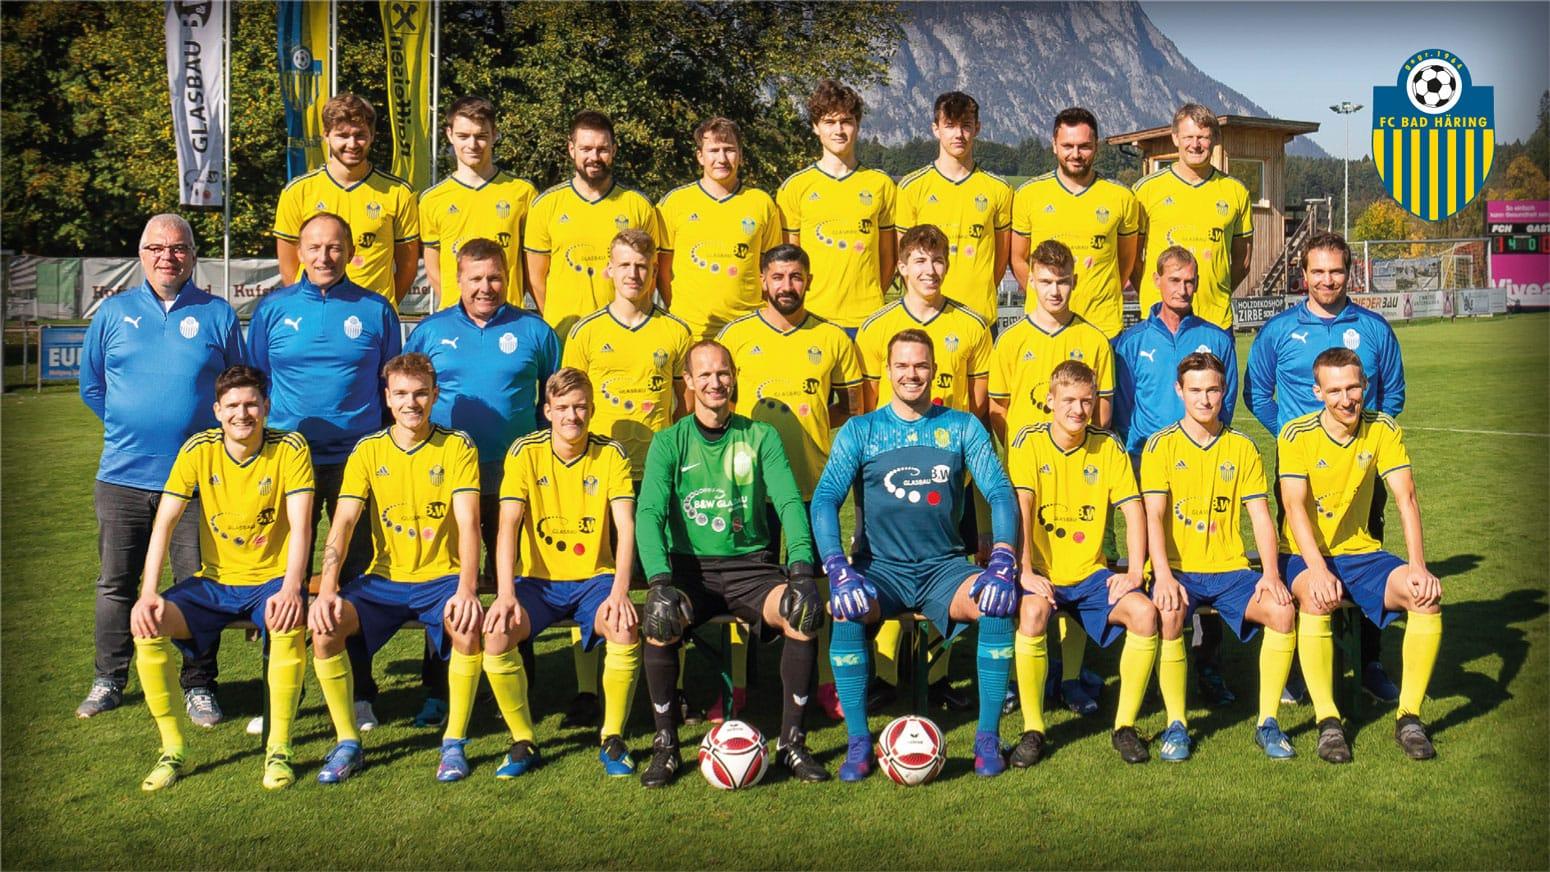 Kampfmannschaft FC Bad Häring 2021